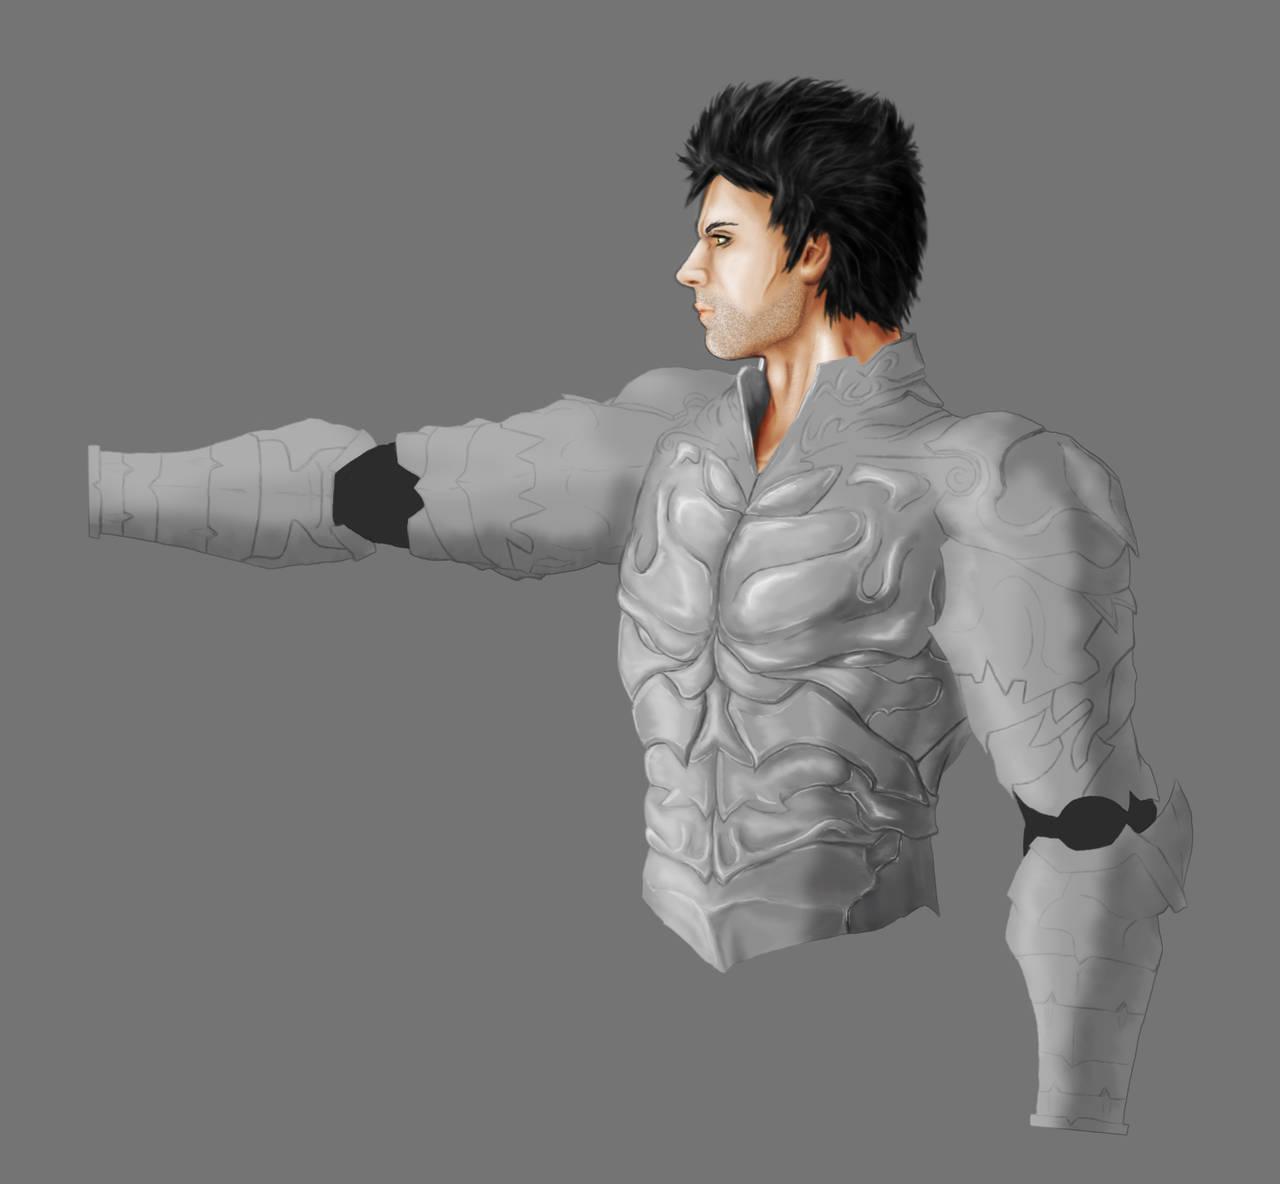 Wrath - the Third Original WIP Silver Armour by 3DPad